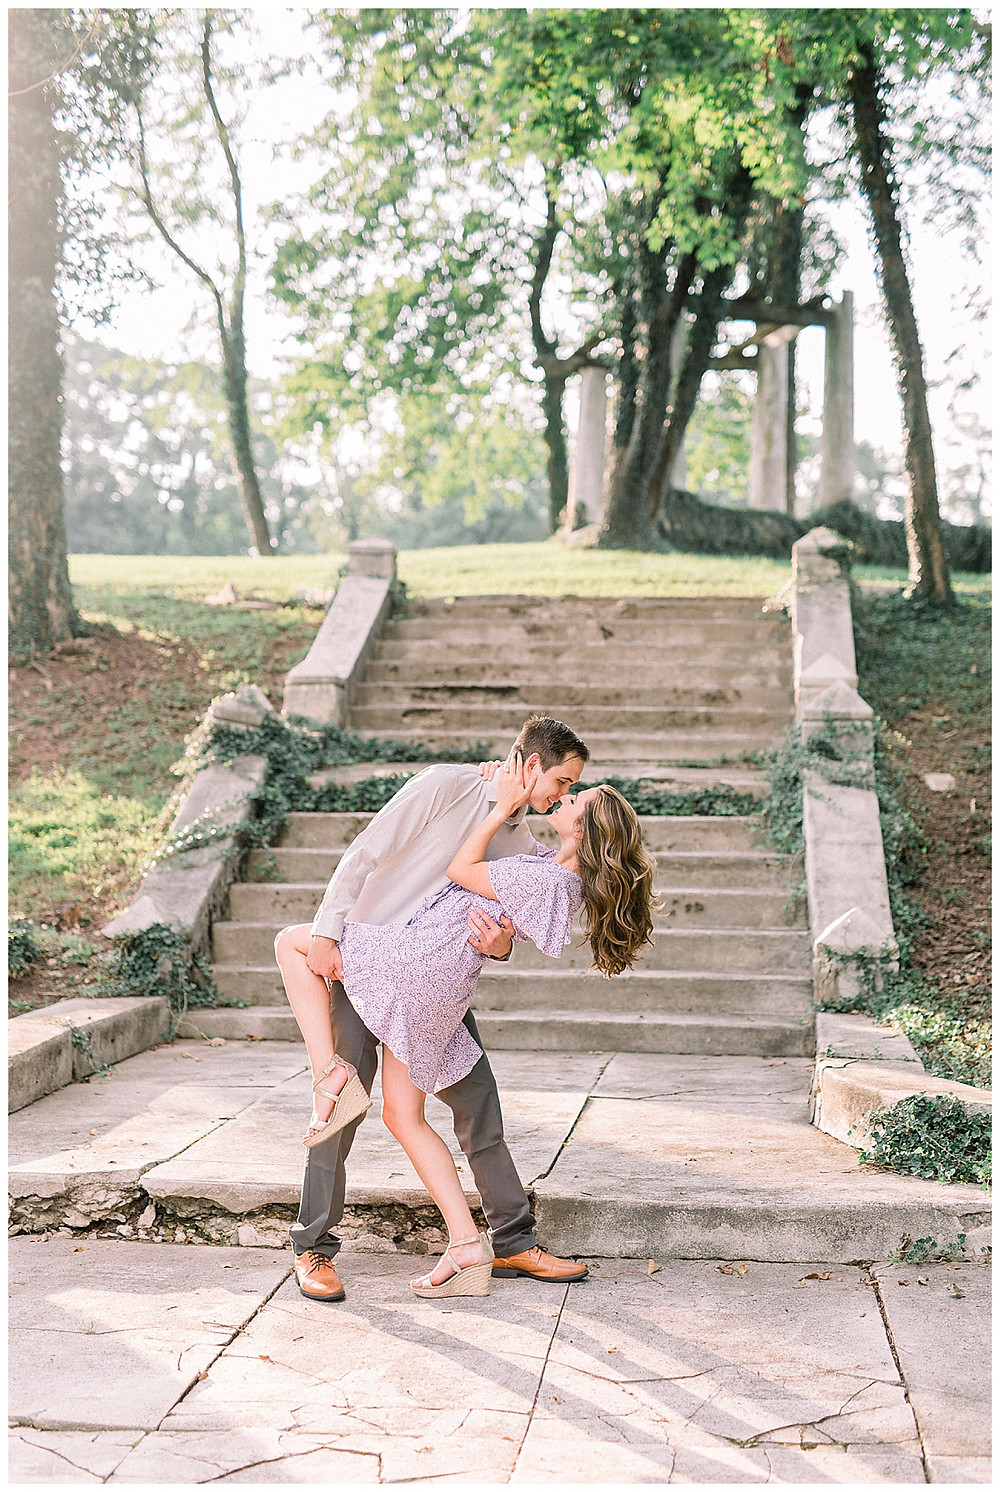 A man dipping his fiancé at Historic Shady Lane